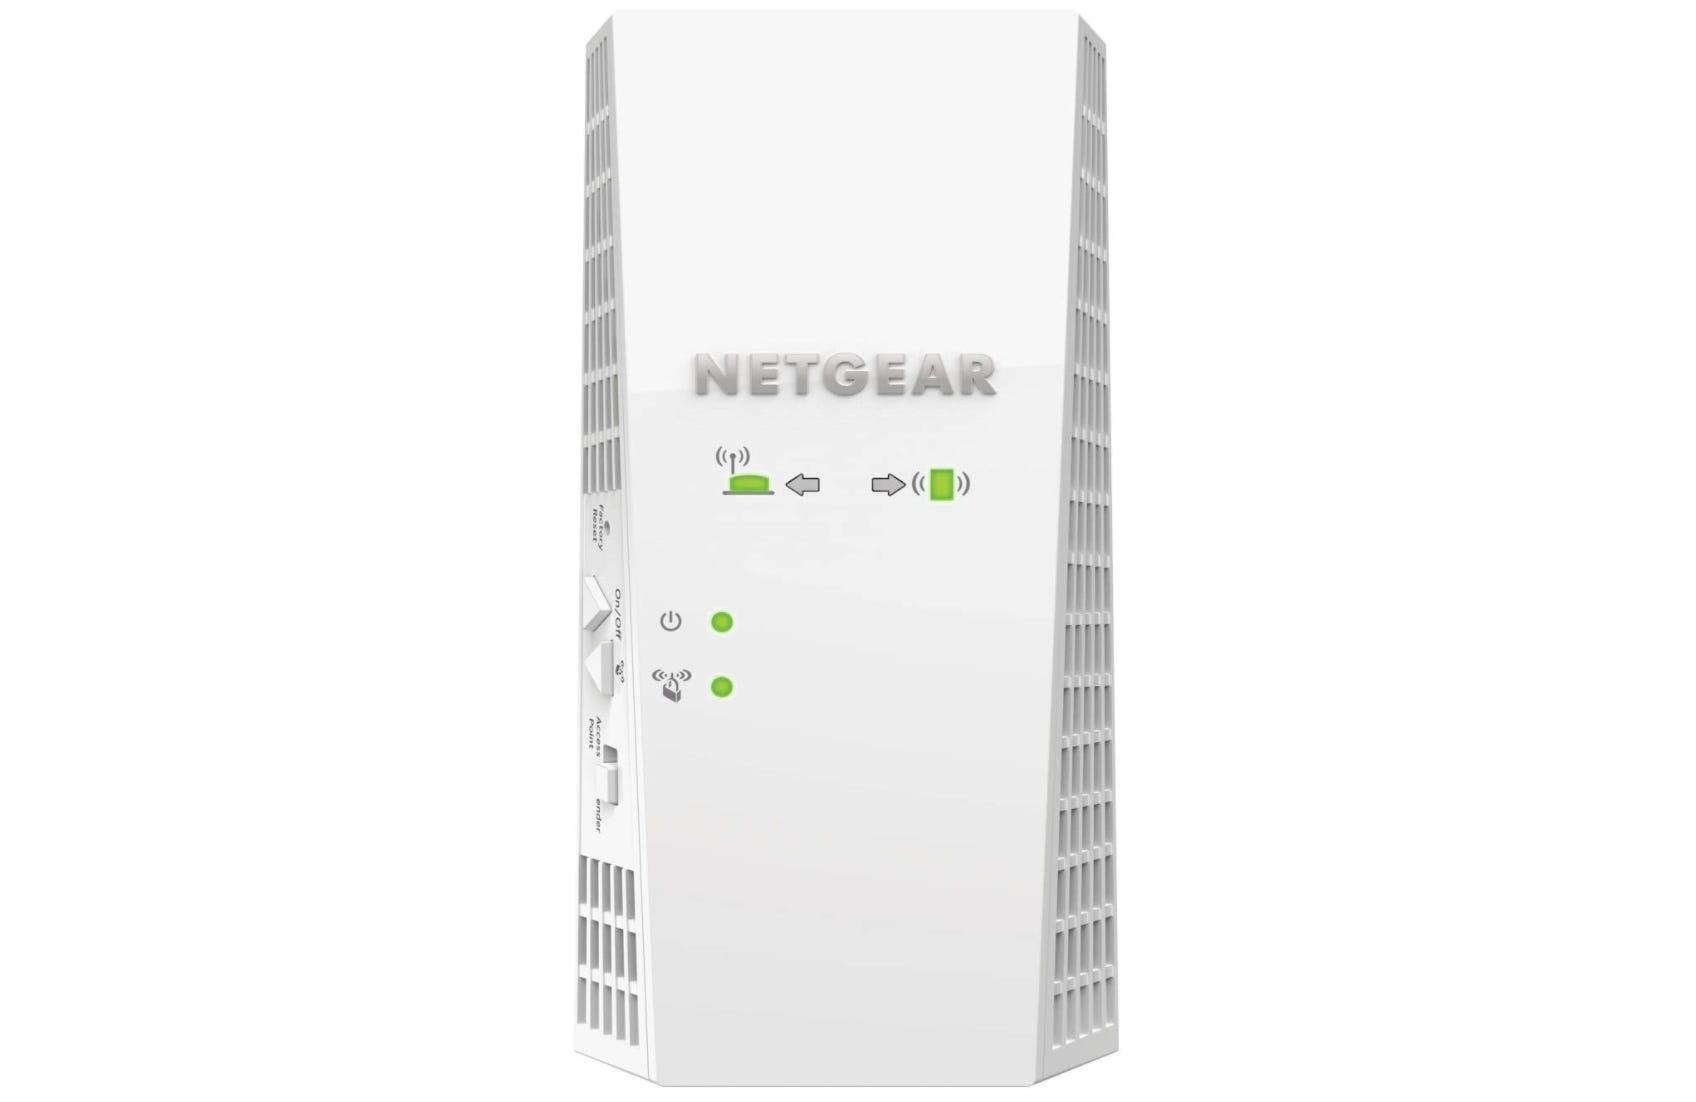 Netgear X4 range extender